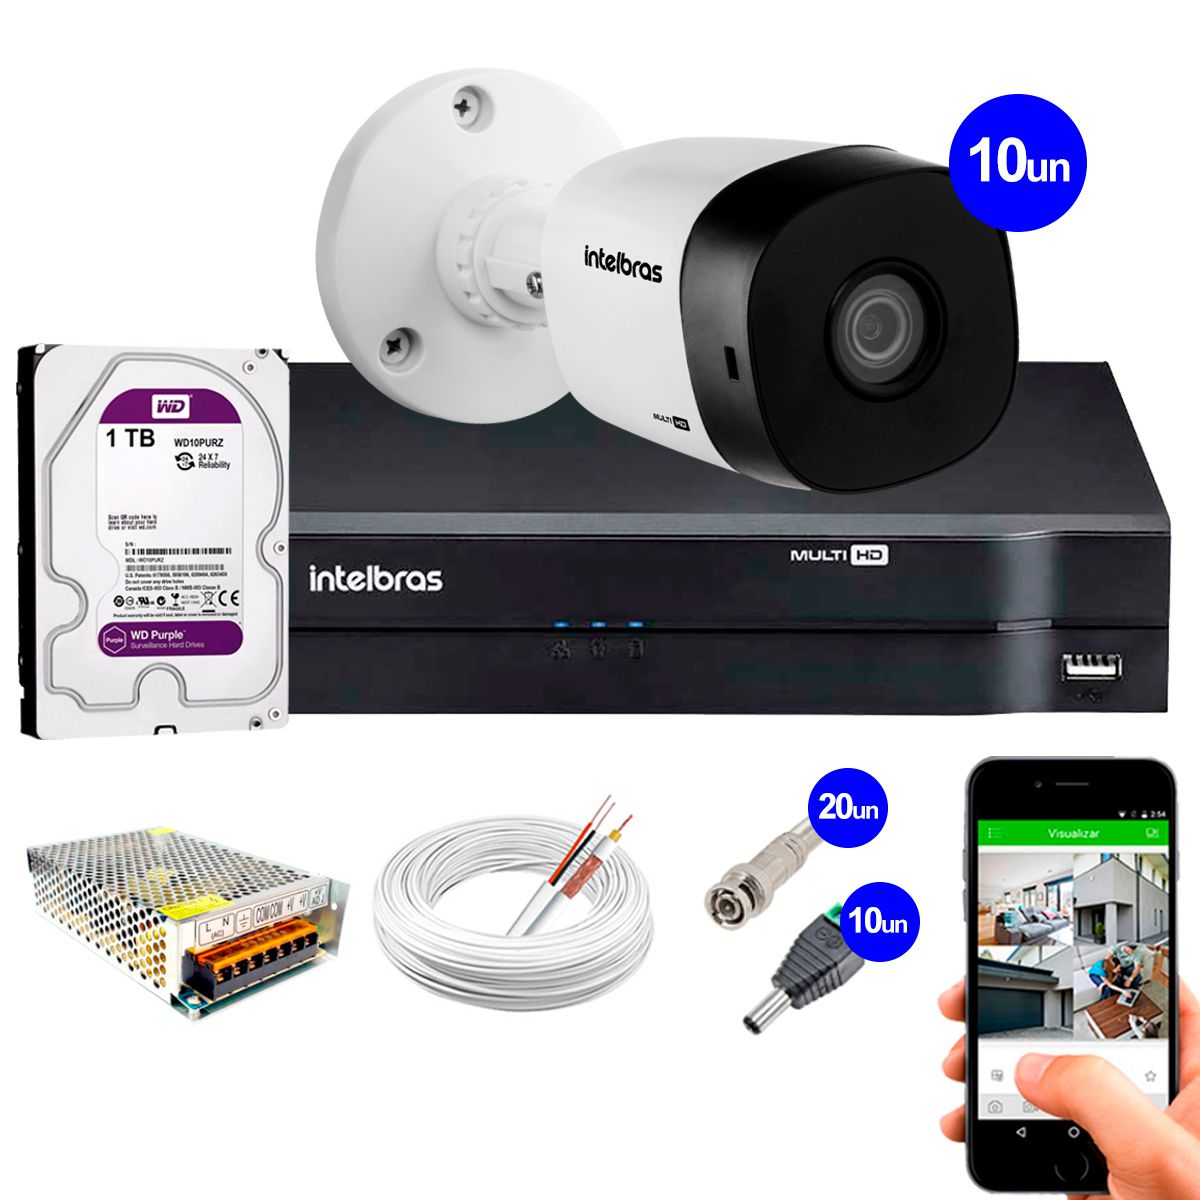 Kit 10 Câmeras VHD 1120 B G5 + DVR Intelbras + HD 1TB para Armazenamento + App Grátis de Monitoramento, Câmeras HD 720p 20m Infravermelho  - Tudo Forte